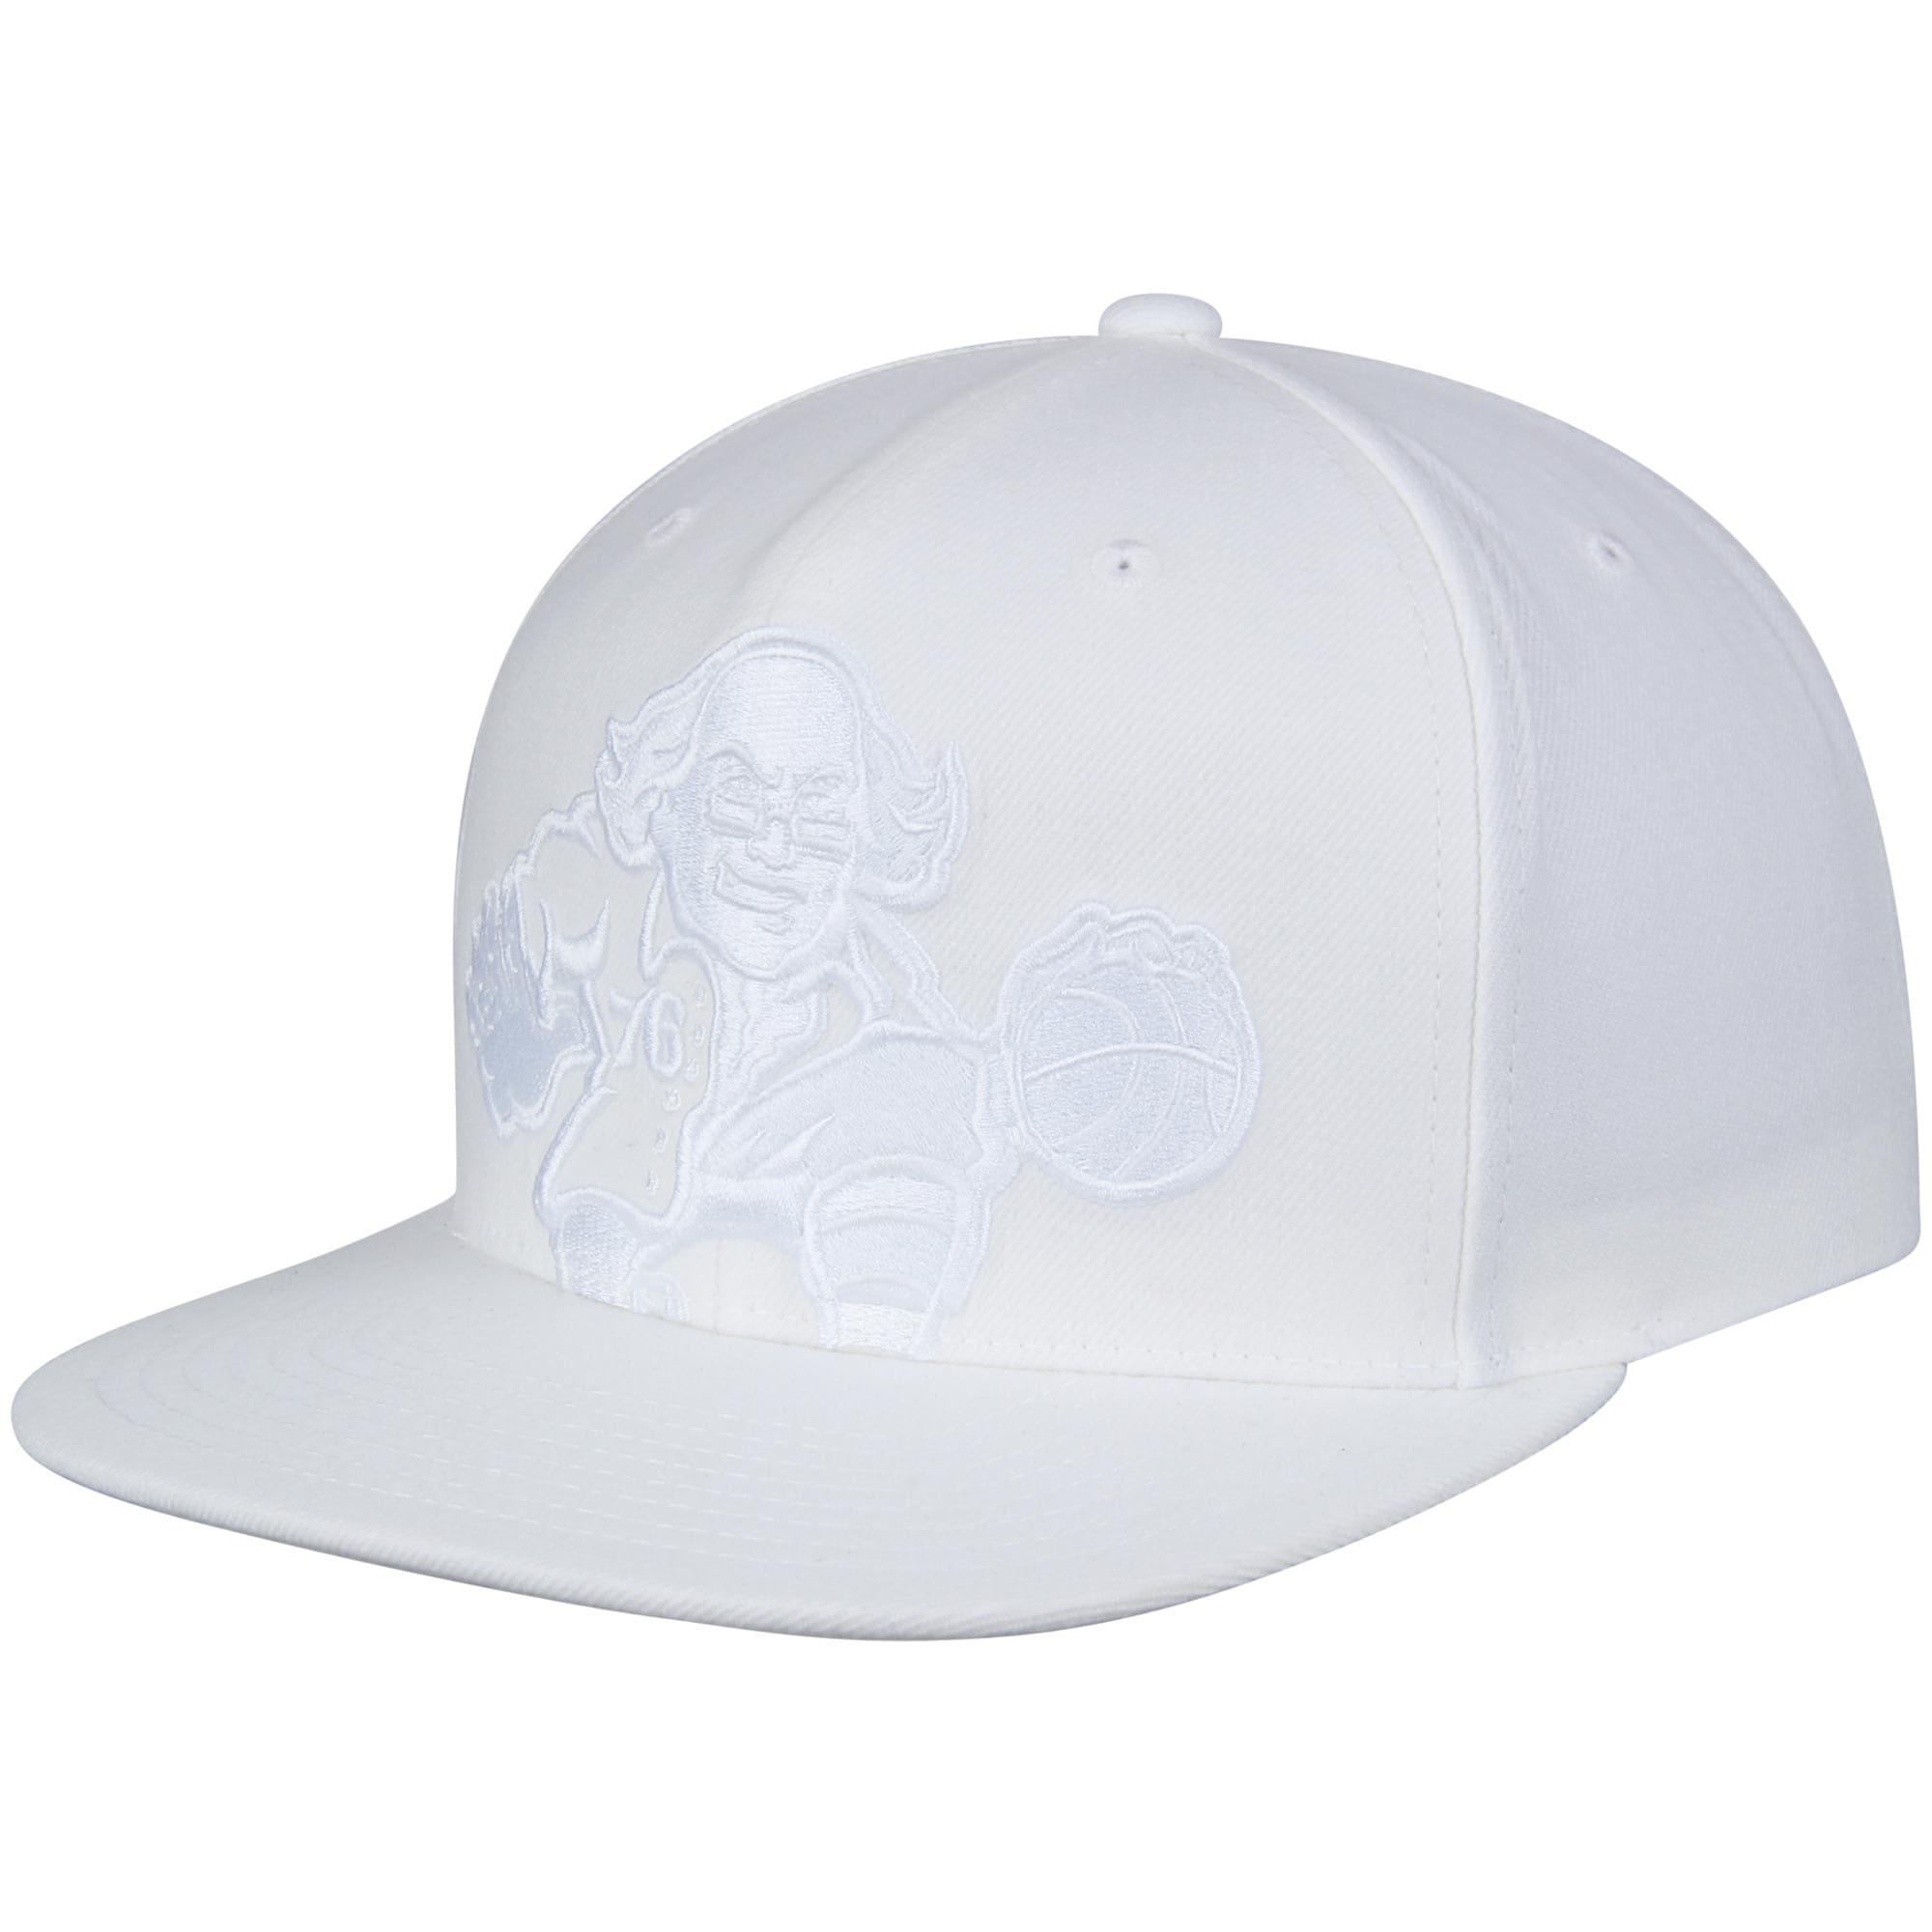 Philadelphia 76ers Mitchell & Ness Cropped XL Logo Snapback Adjustable Hat - White